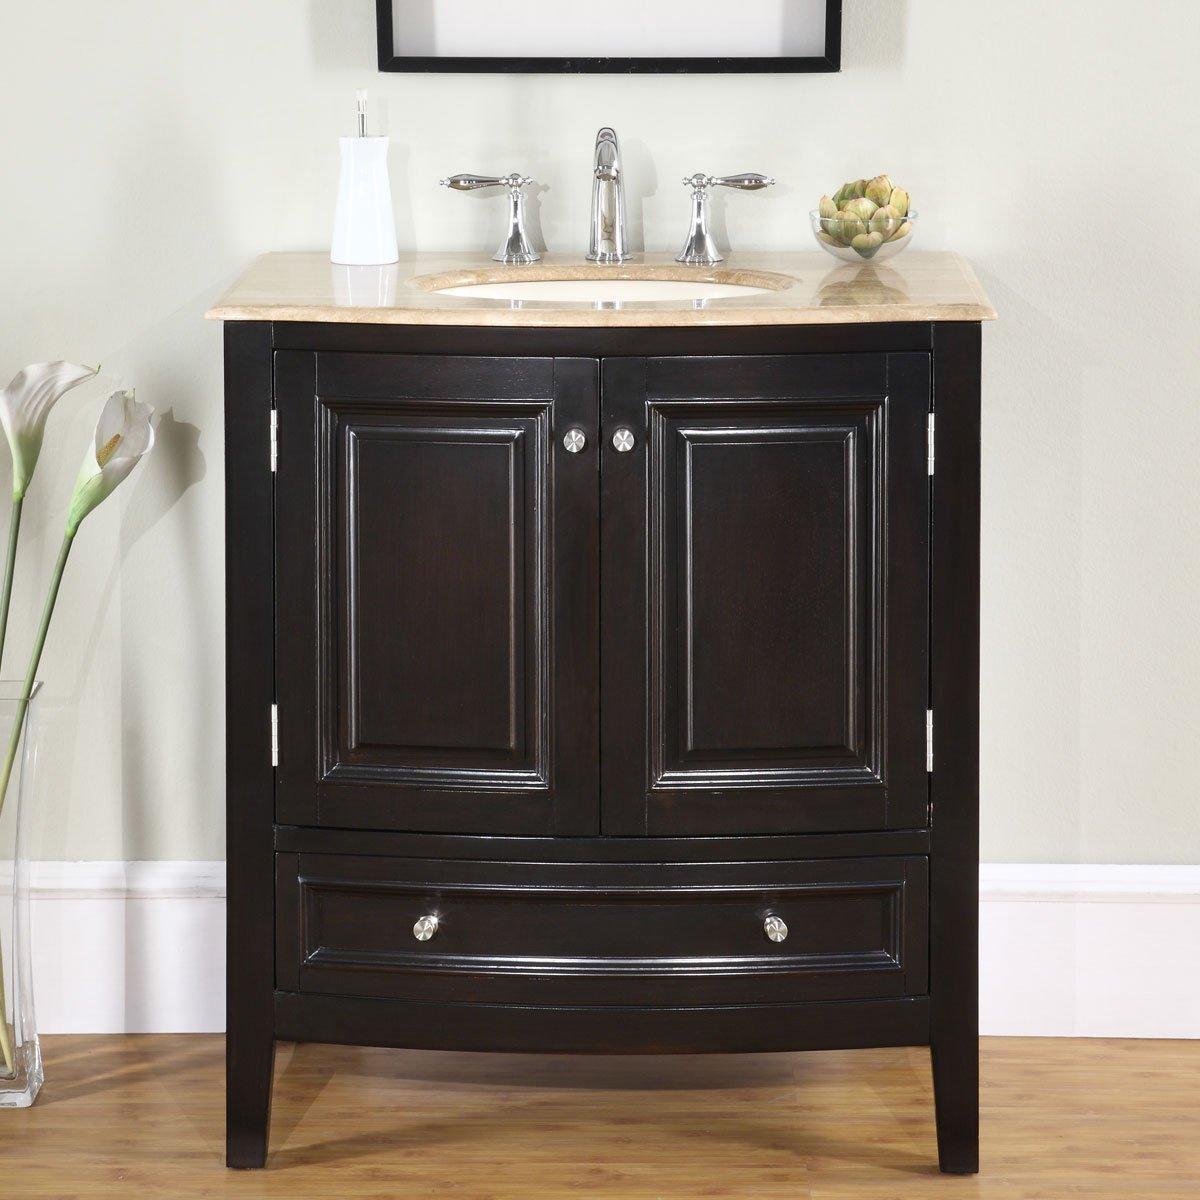 Amazon.com: Silkroad Exclusive Travertine Stone Top Single Sink Bathroom  Vanity With Furniture Cabinet, 32 Inch: Home U0026 Kitchen